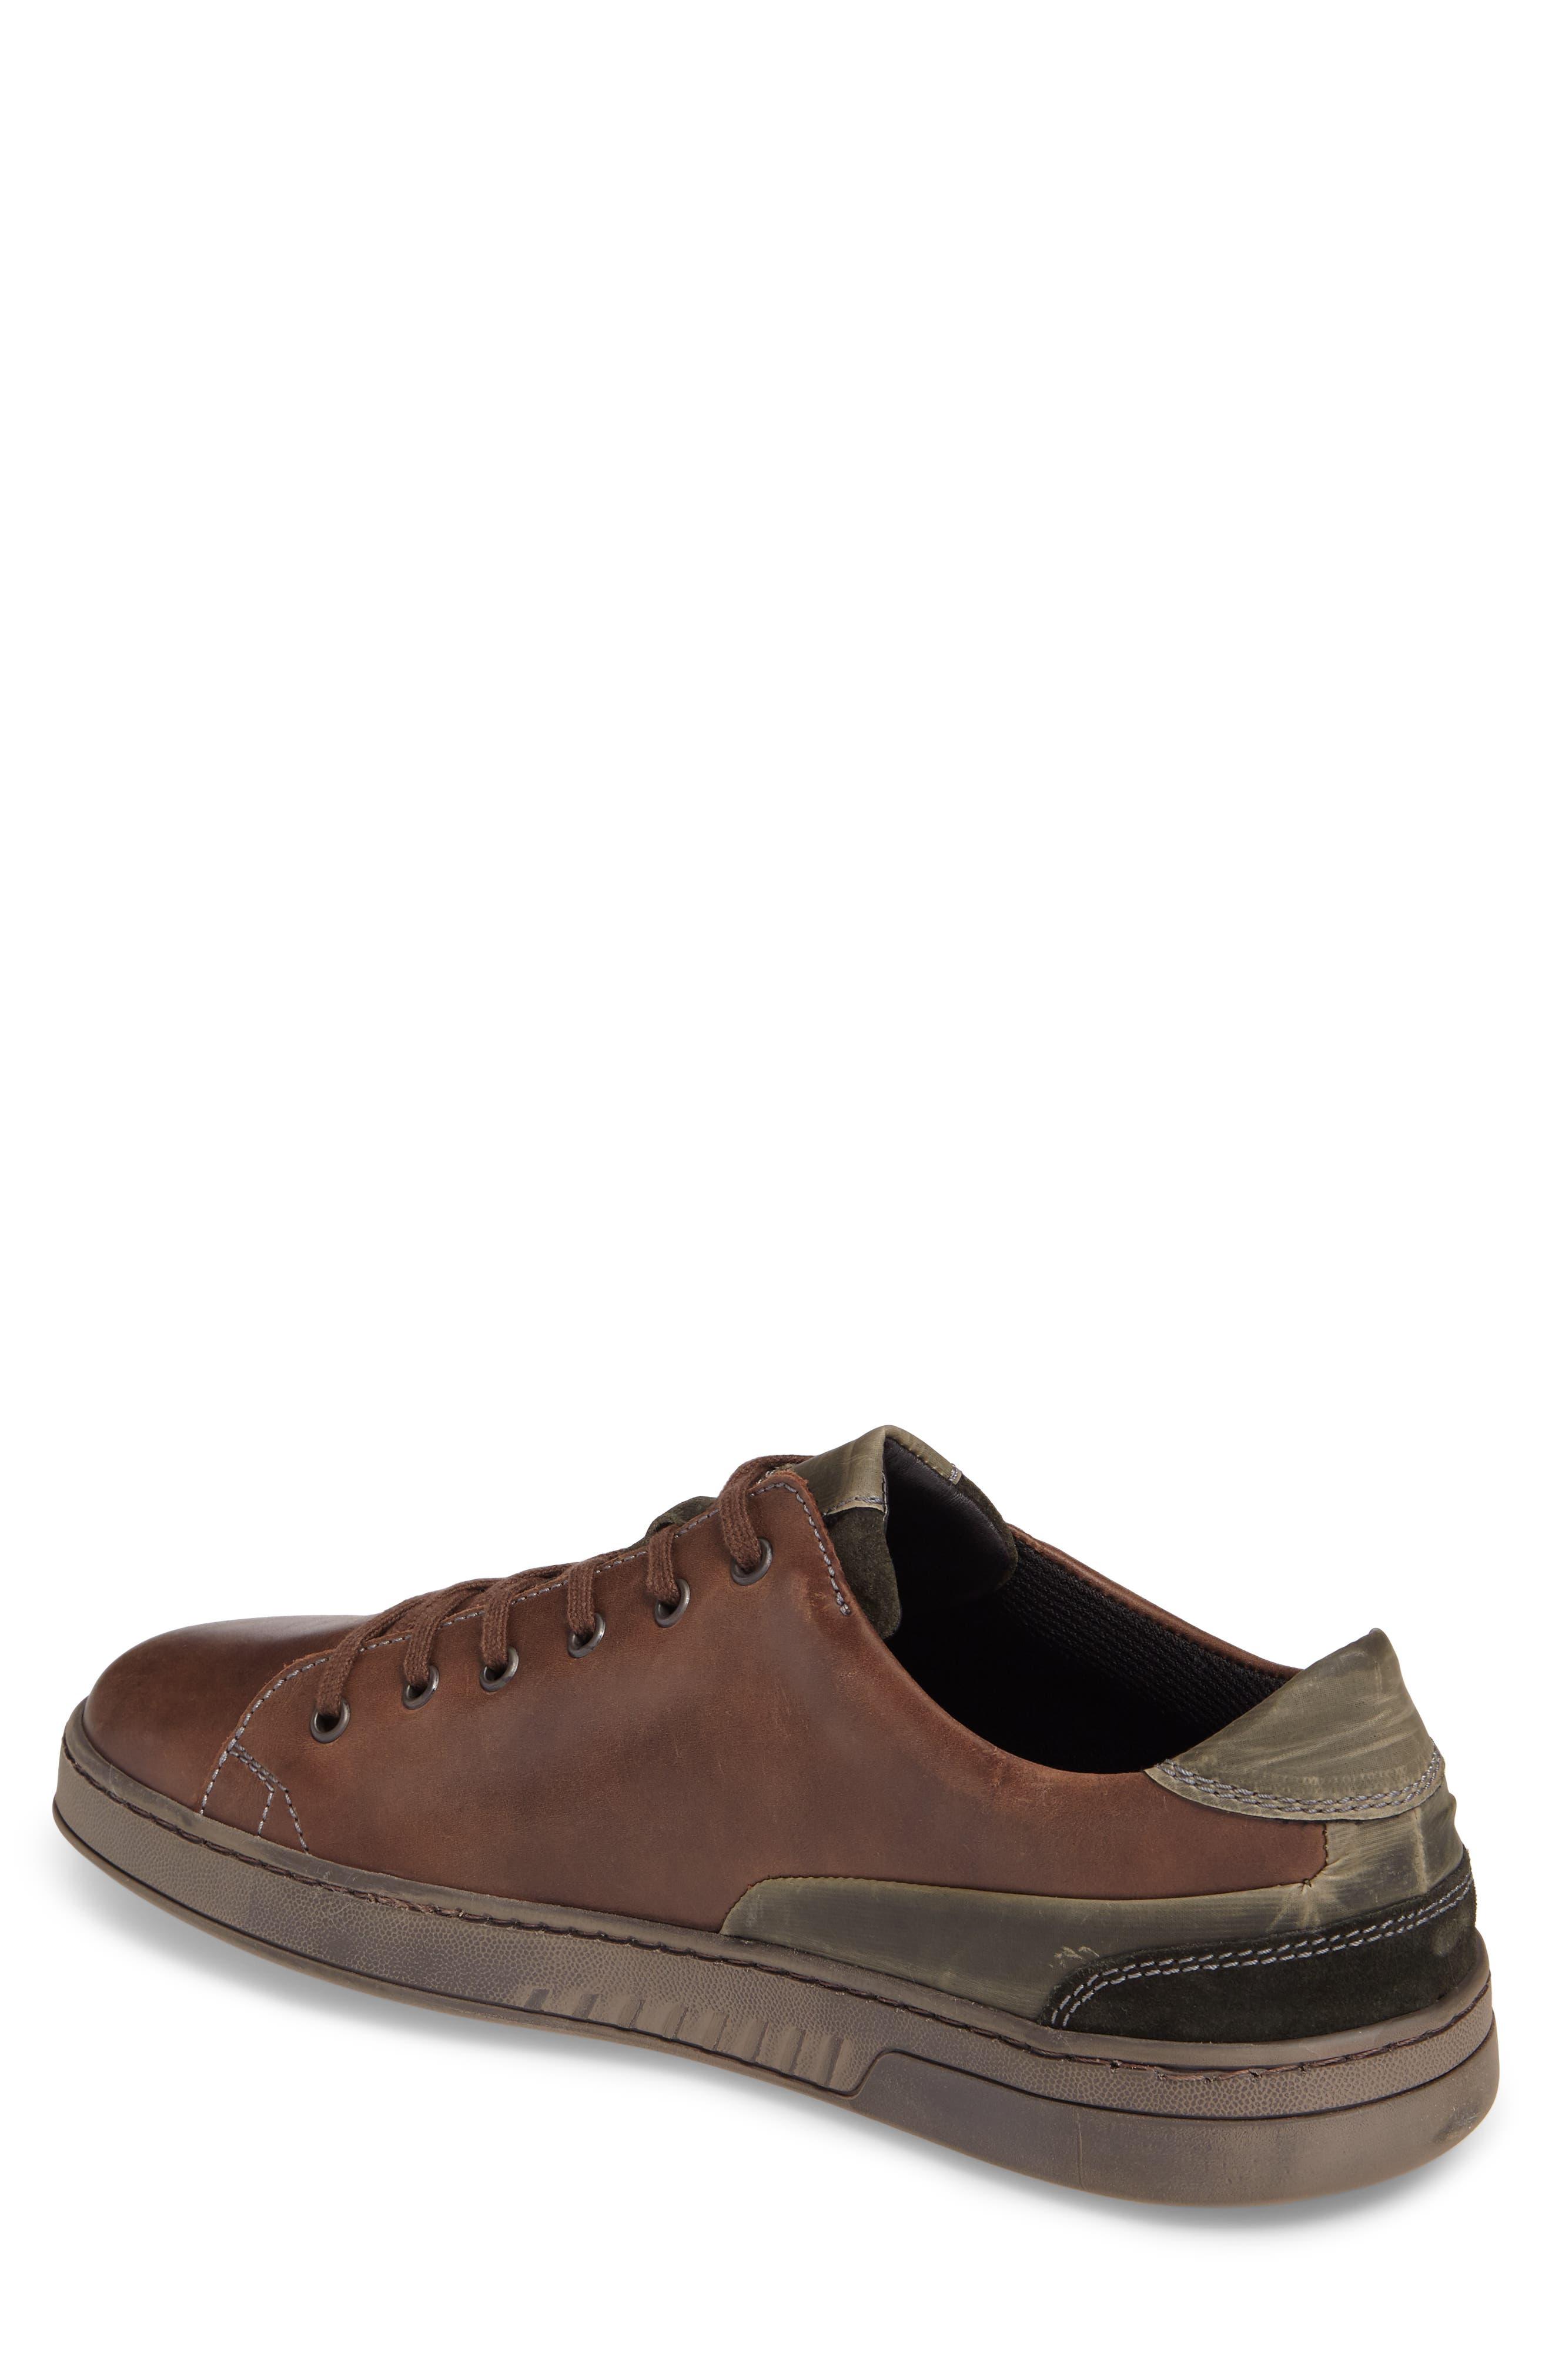 Alternate Image 2  - Josef Seibel Dresda 23 Sneaker (Men)